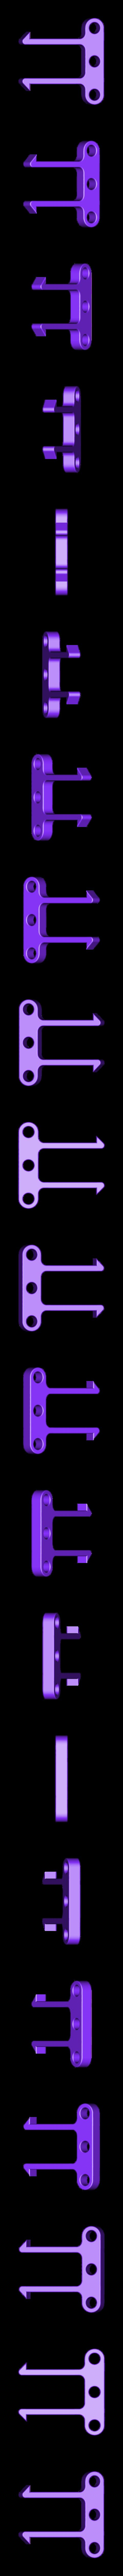 Shoe_Lock_Clip.stl Download free STL file Shoelace Locks • Model to 3D print, PentlandDesigns